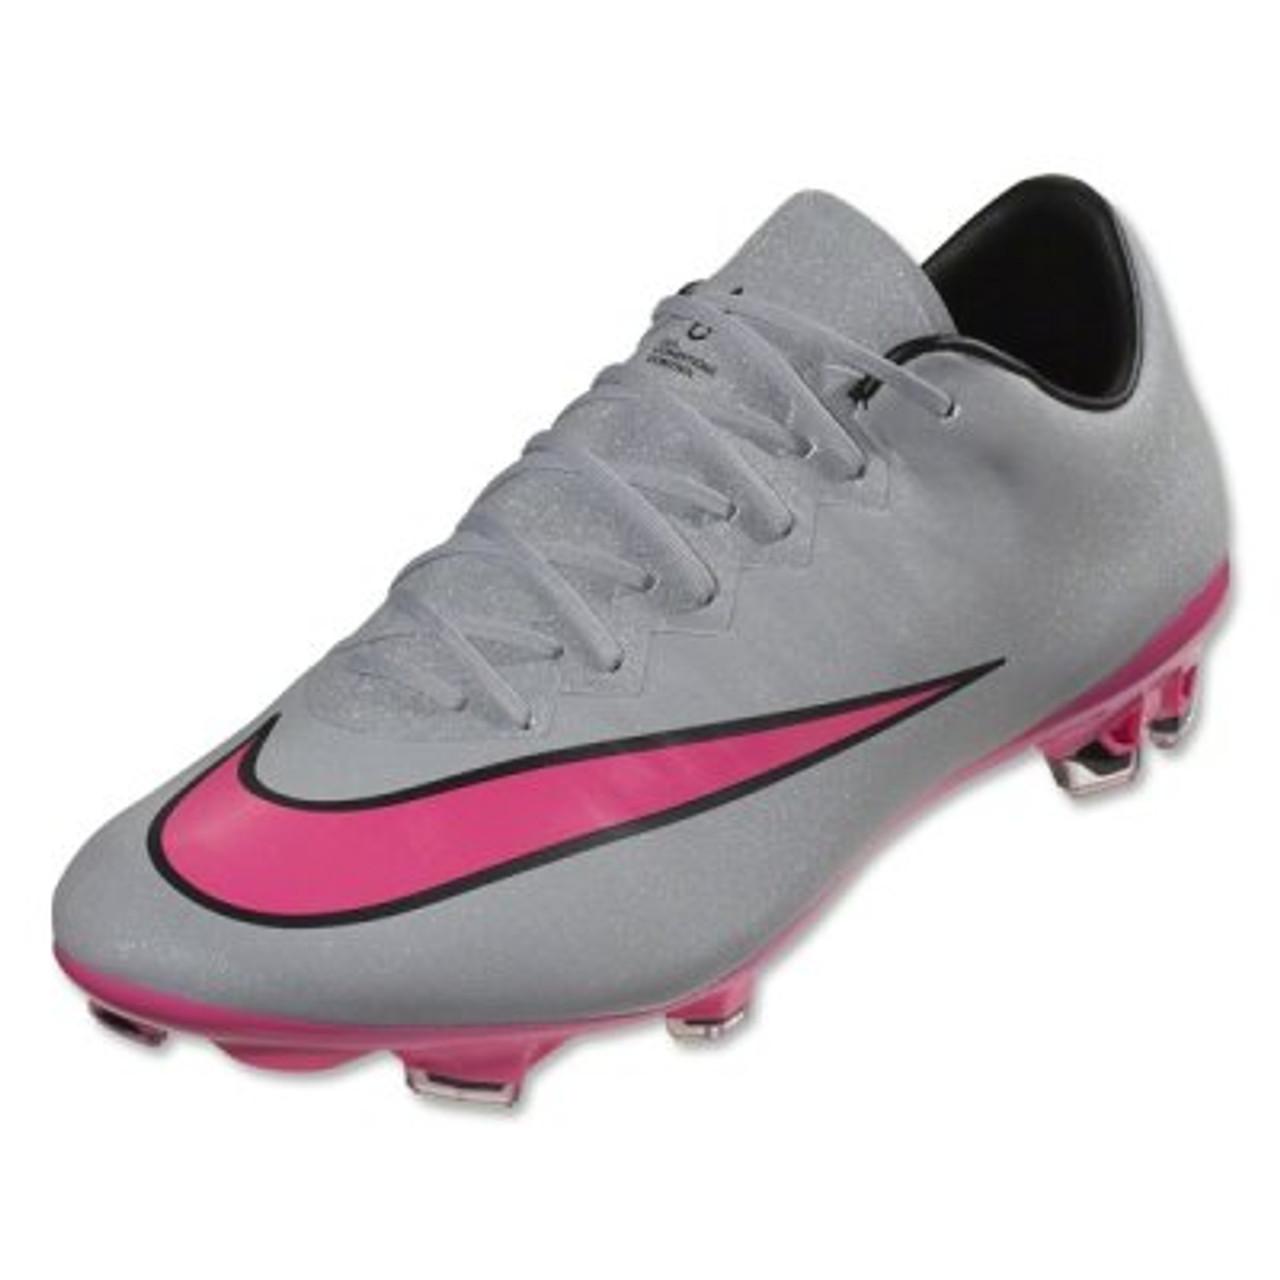 online store 4550d acbb0 Nike Mercurial Vapor X FG - Wolf Grey/Black/Hyper Pink RC (042719)